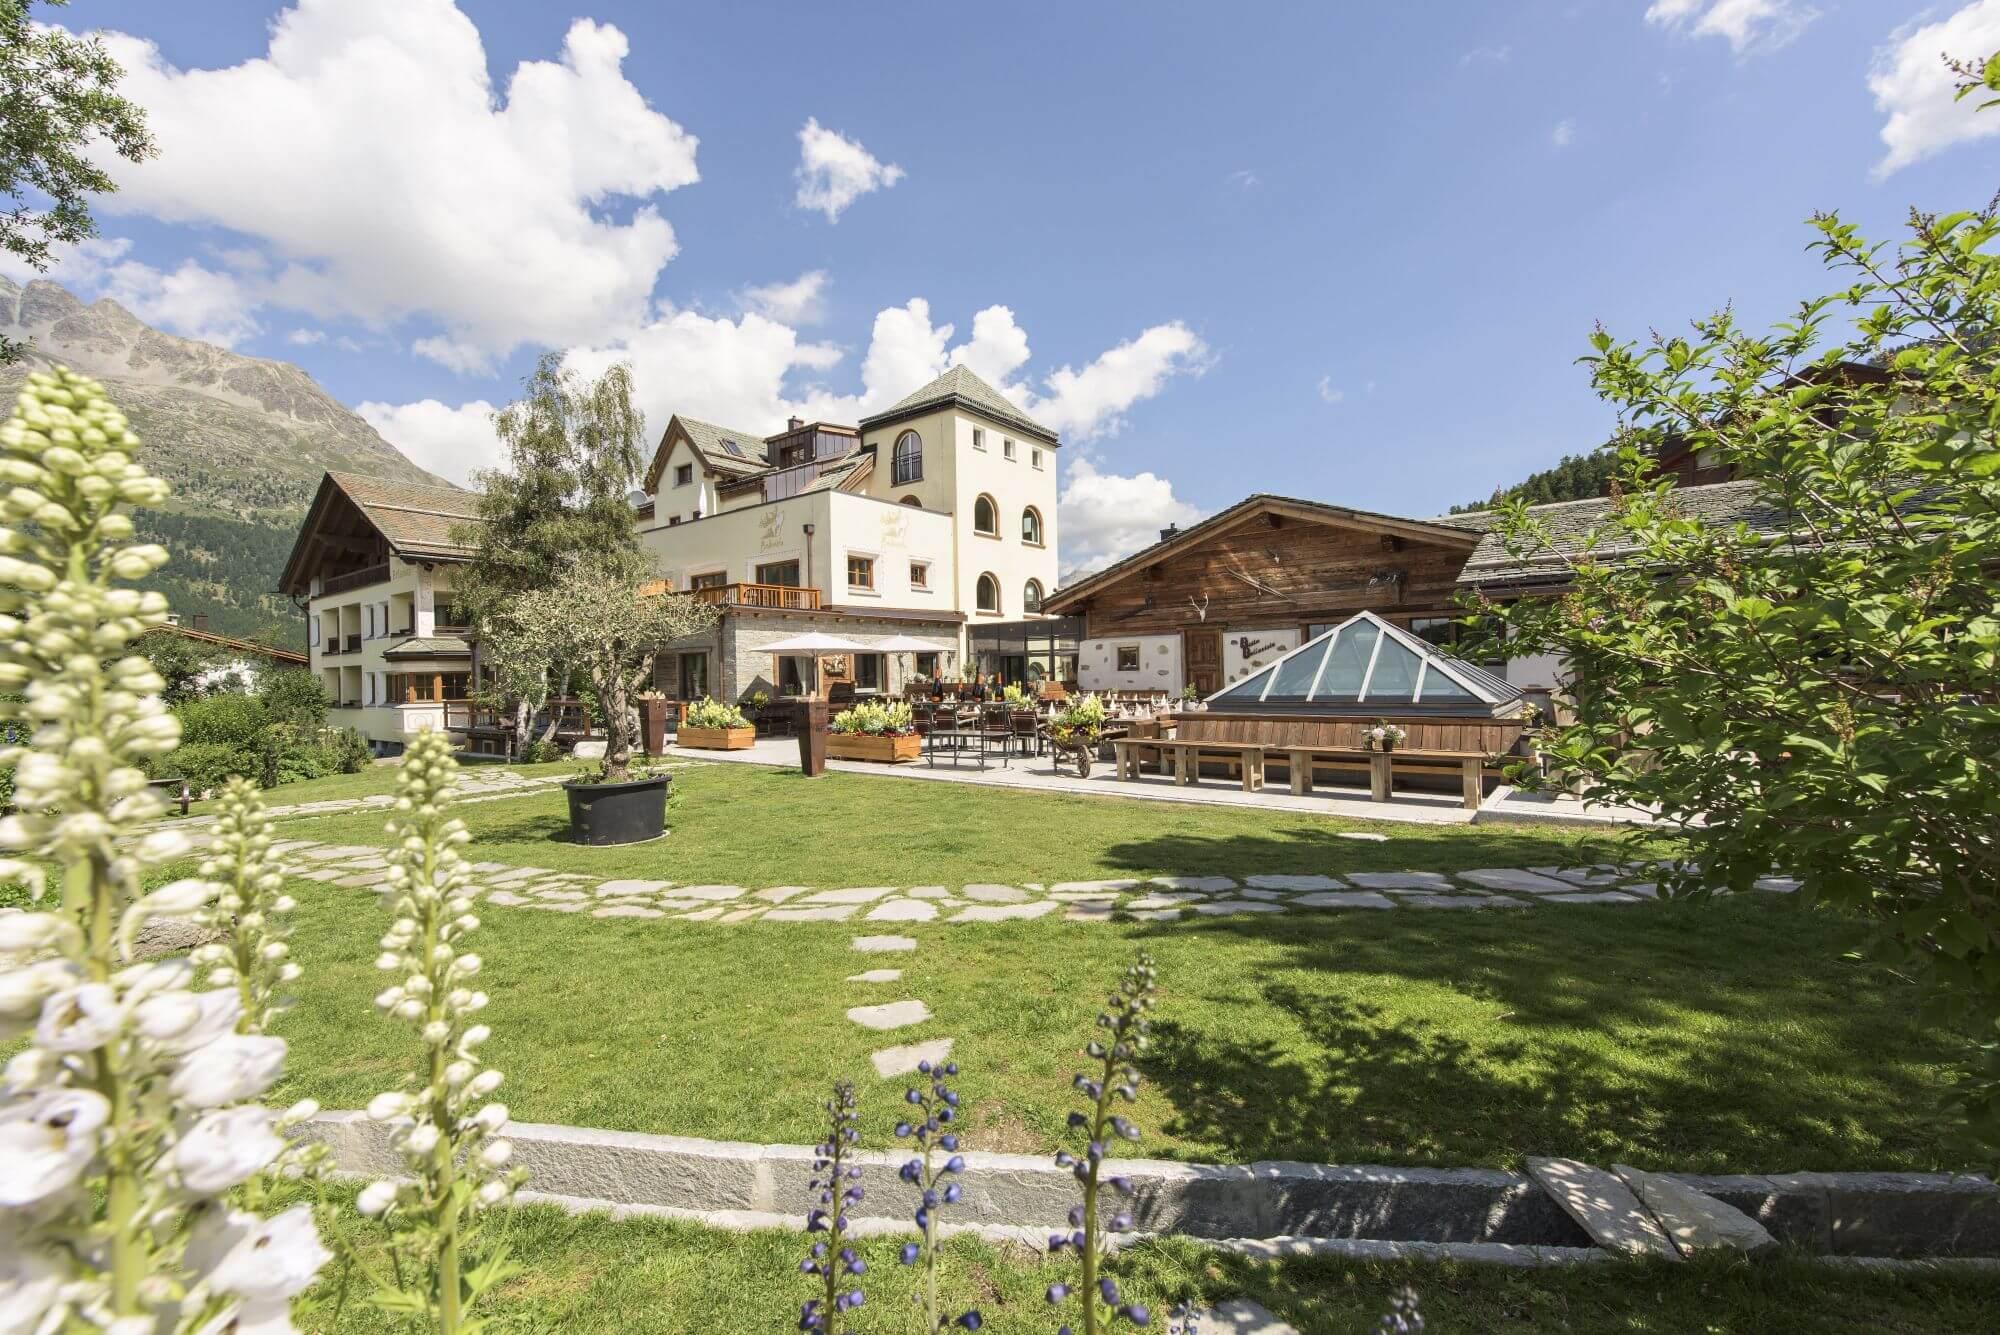 3-tage-im-hotel-bellavista-in-silvaplana-2